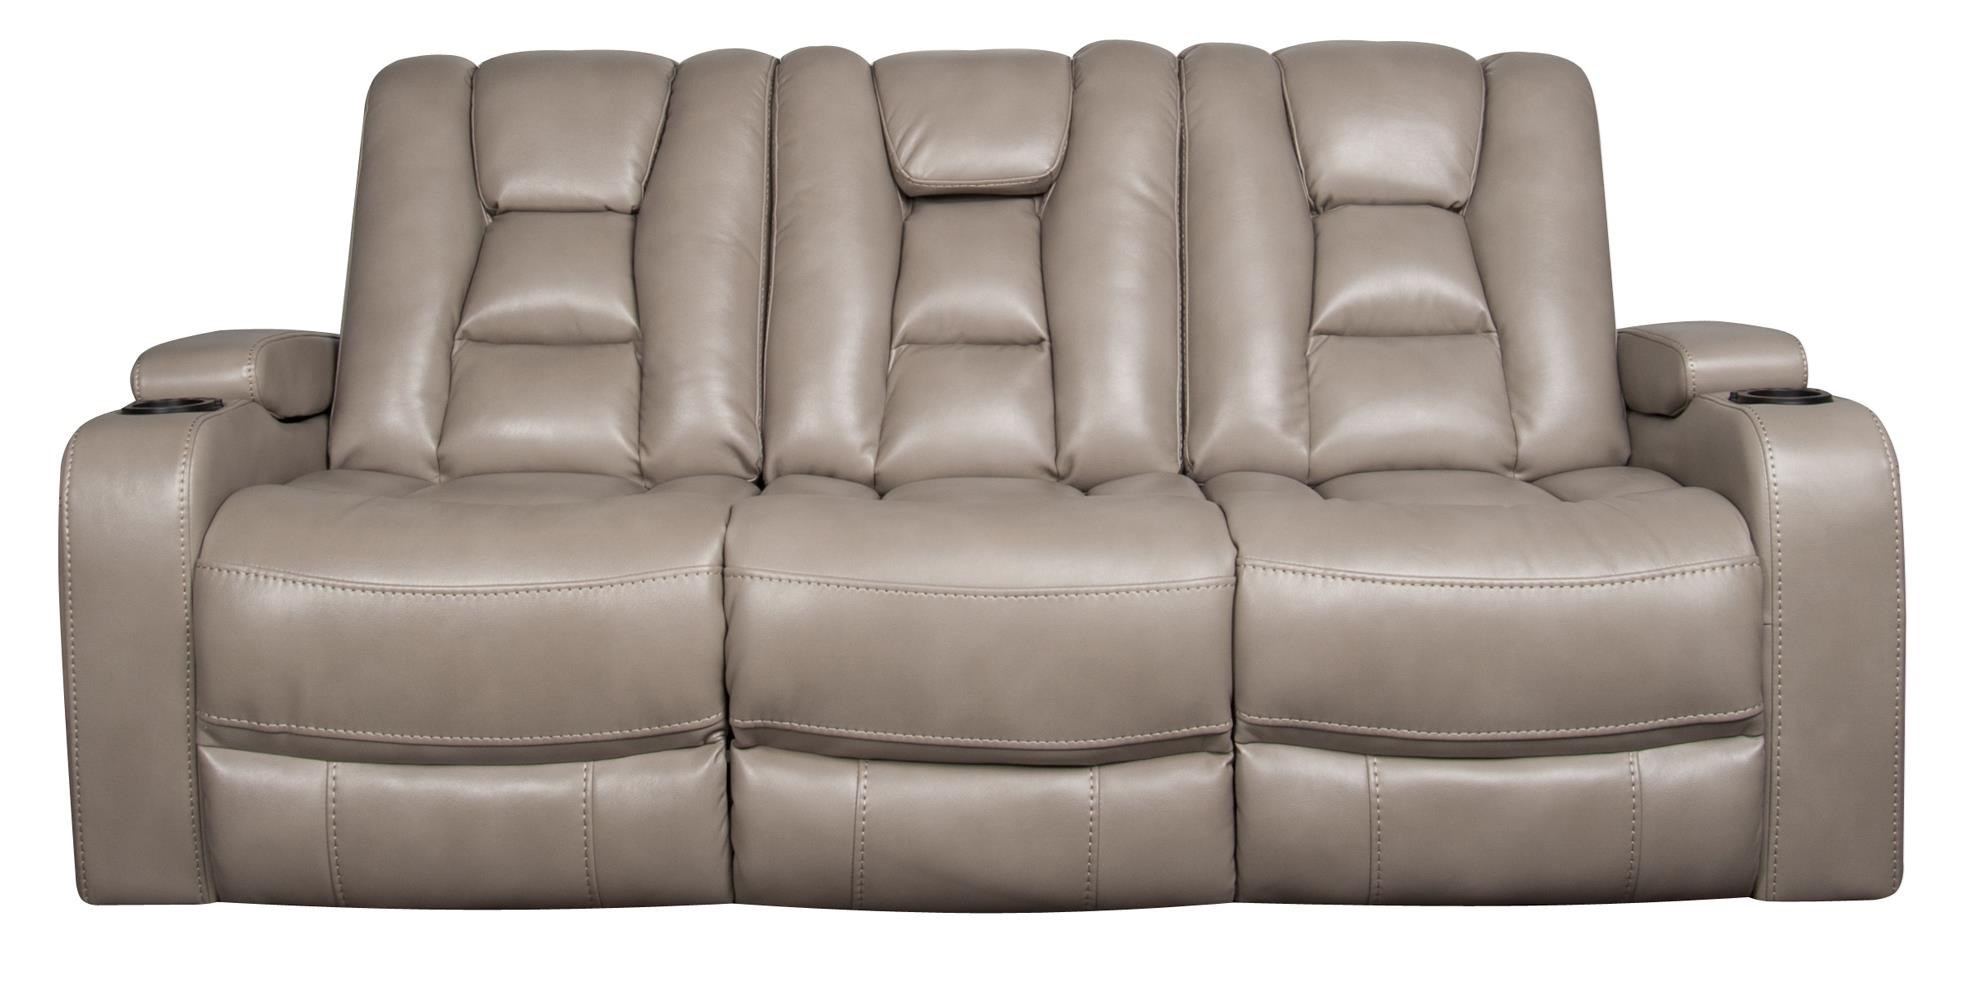 Beau Morris Home RhinehartRhinehart Power Sofa With Headrest ...